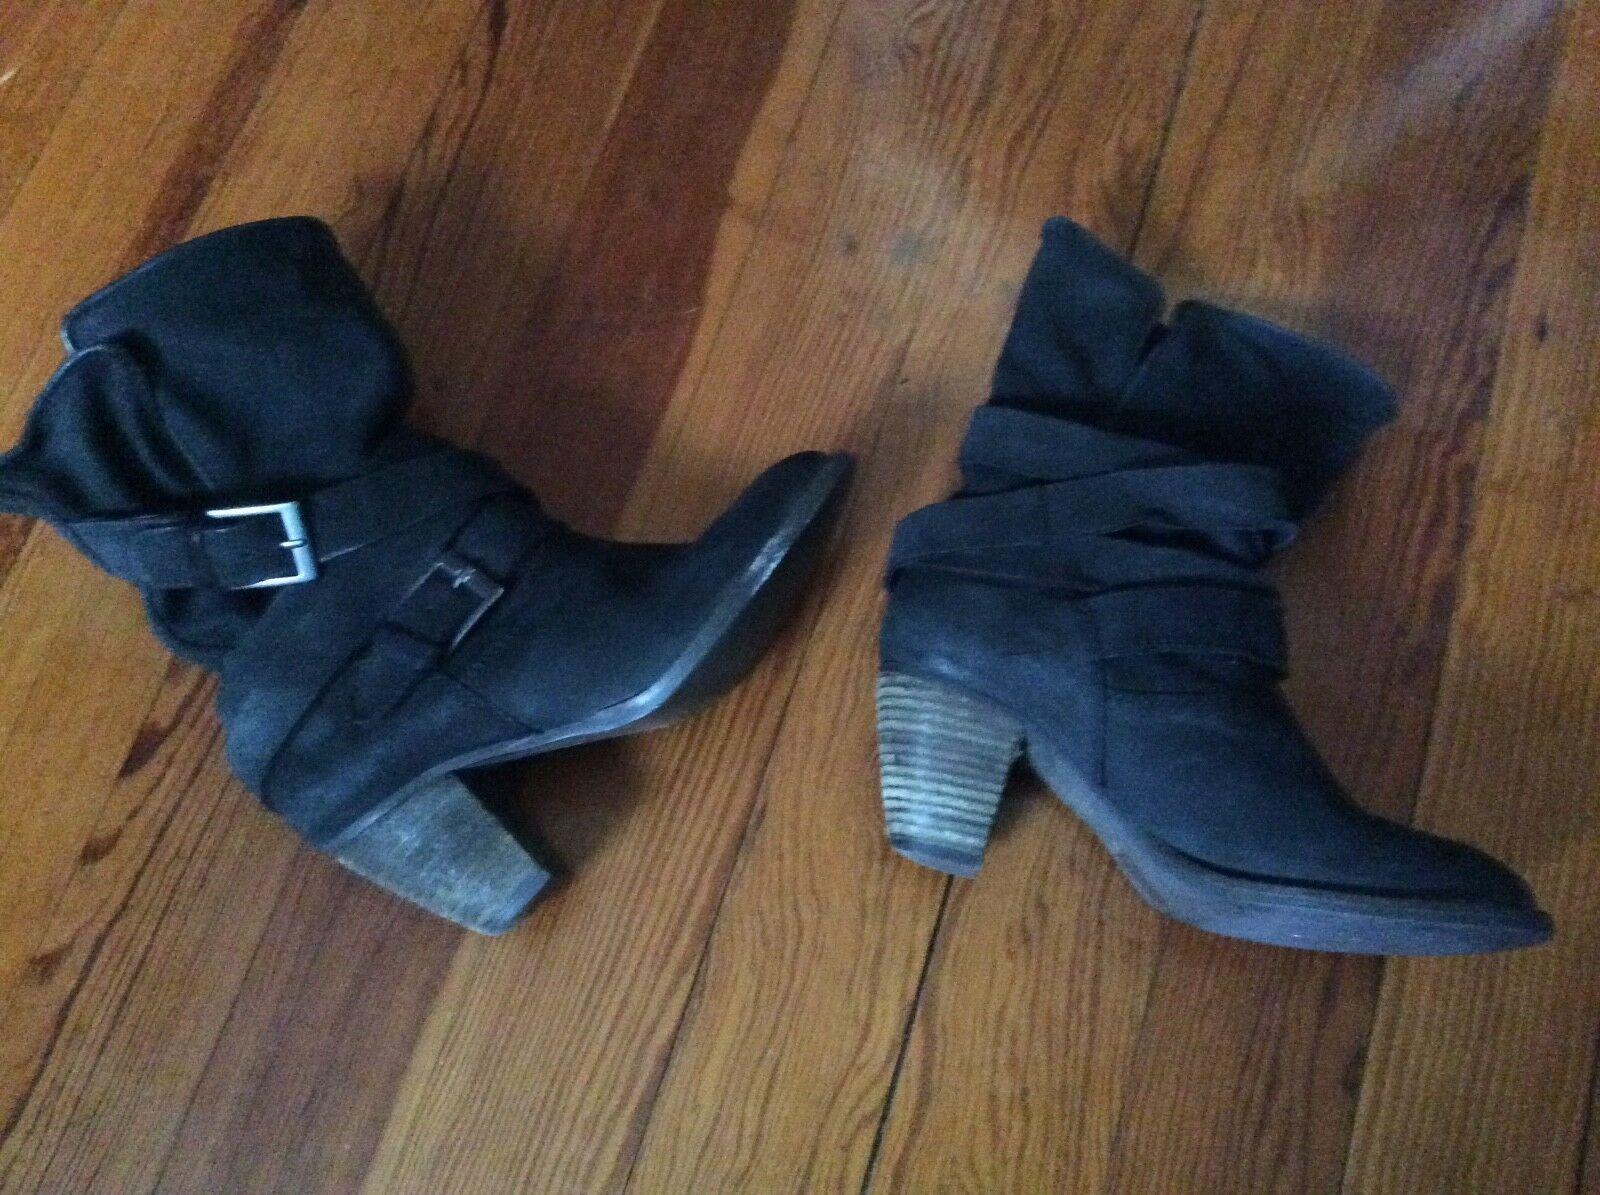 Women's Steven by Steve Madden black leather booties size 8